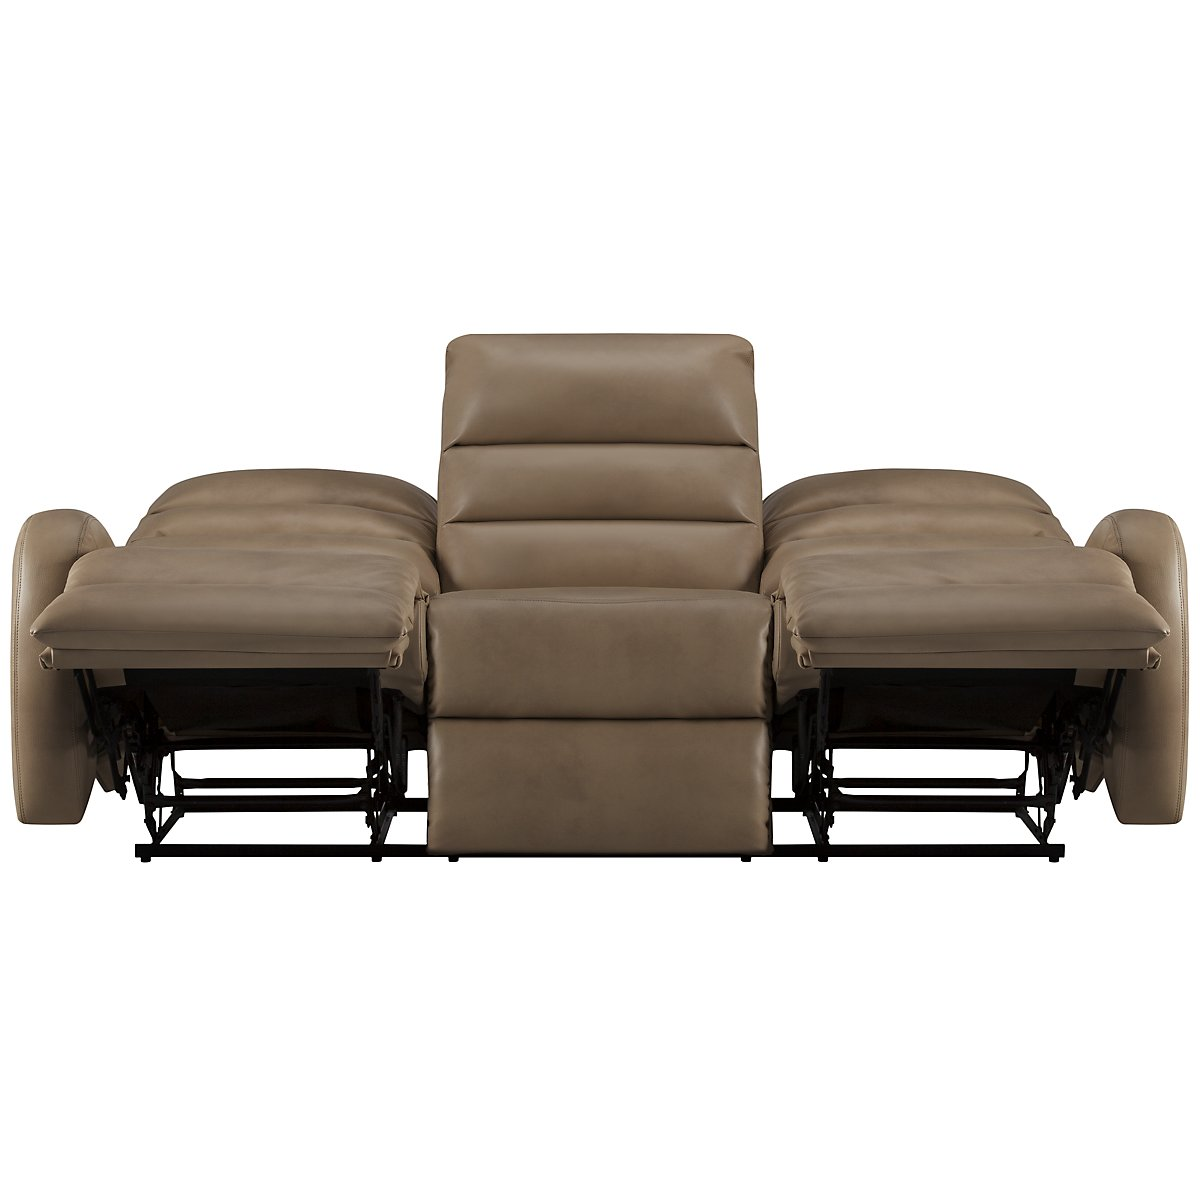 Recliner Sofa Bed Laude Run Orlando Manual Motion